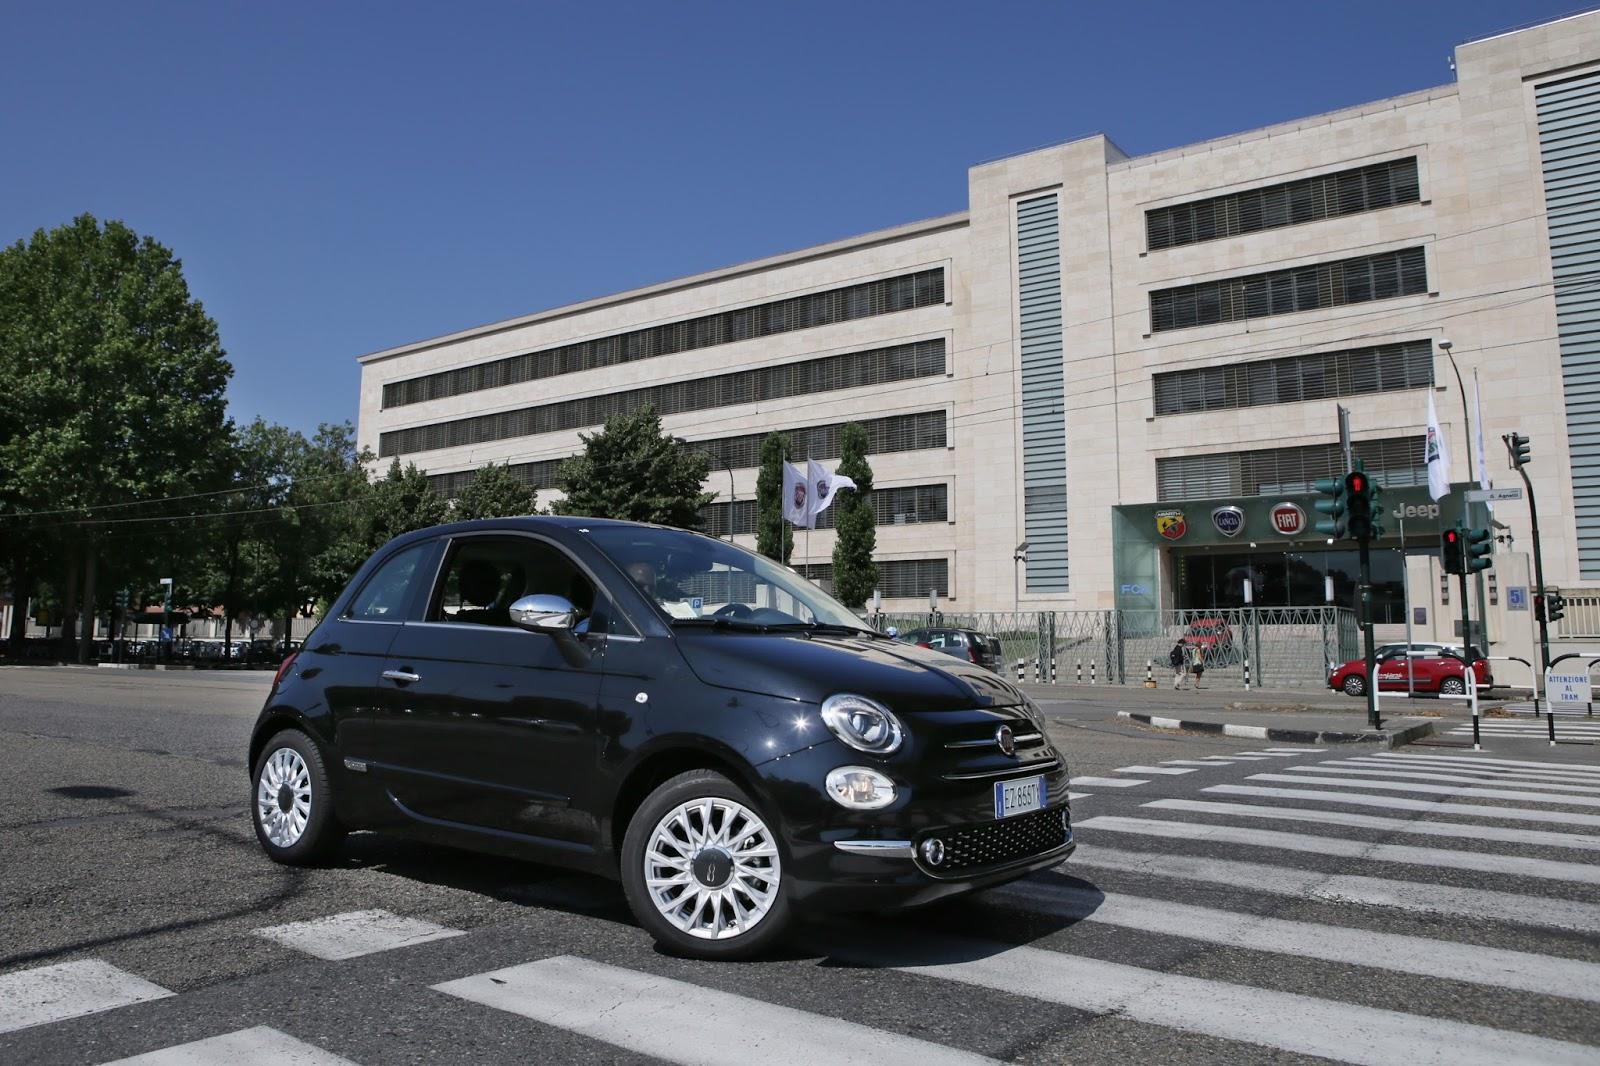 150714 Fiat Nuova 500 12 Η άφιξη του νέου Fiat 500 είναι γεγονός